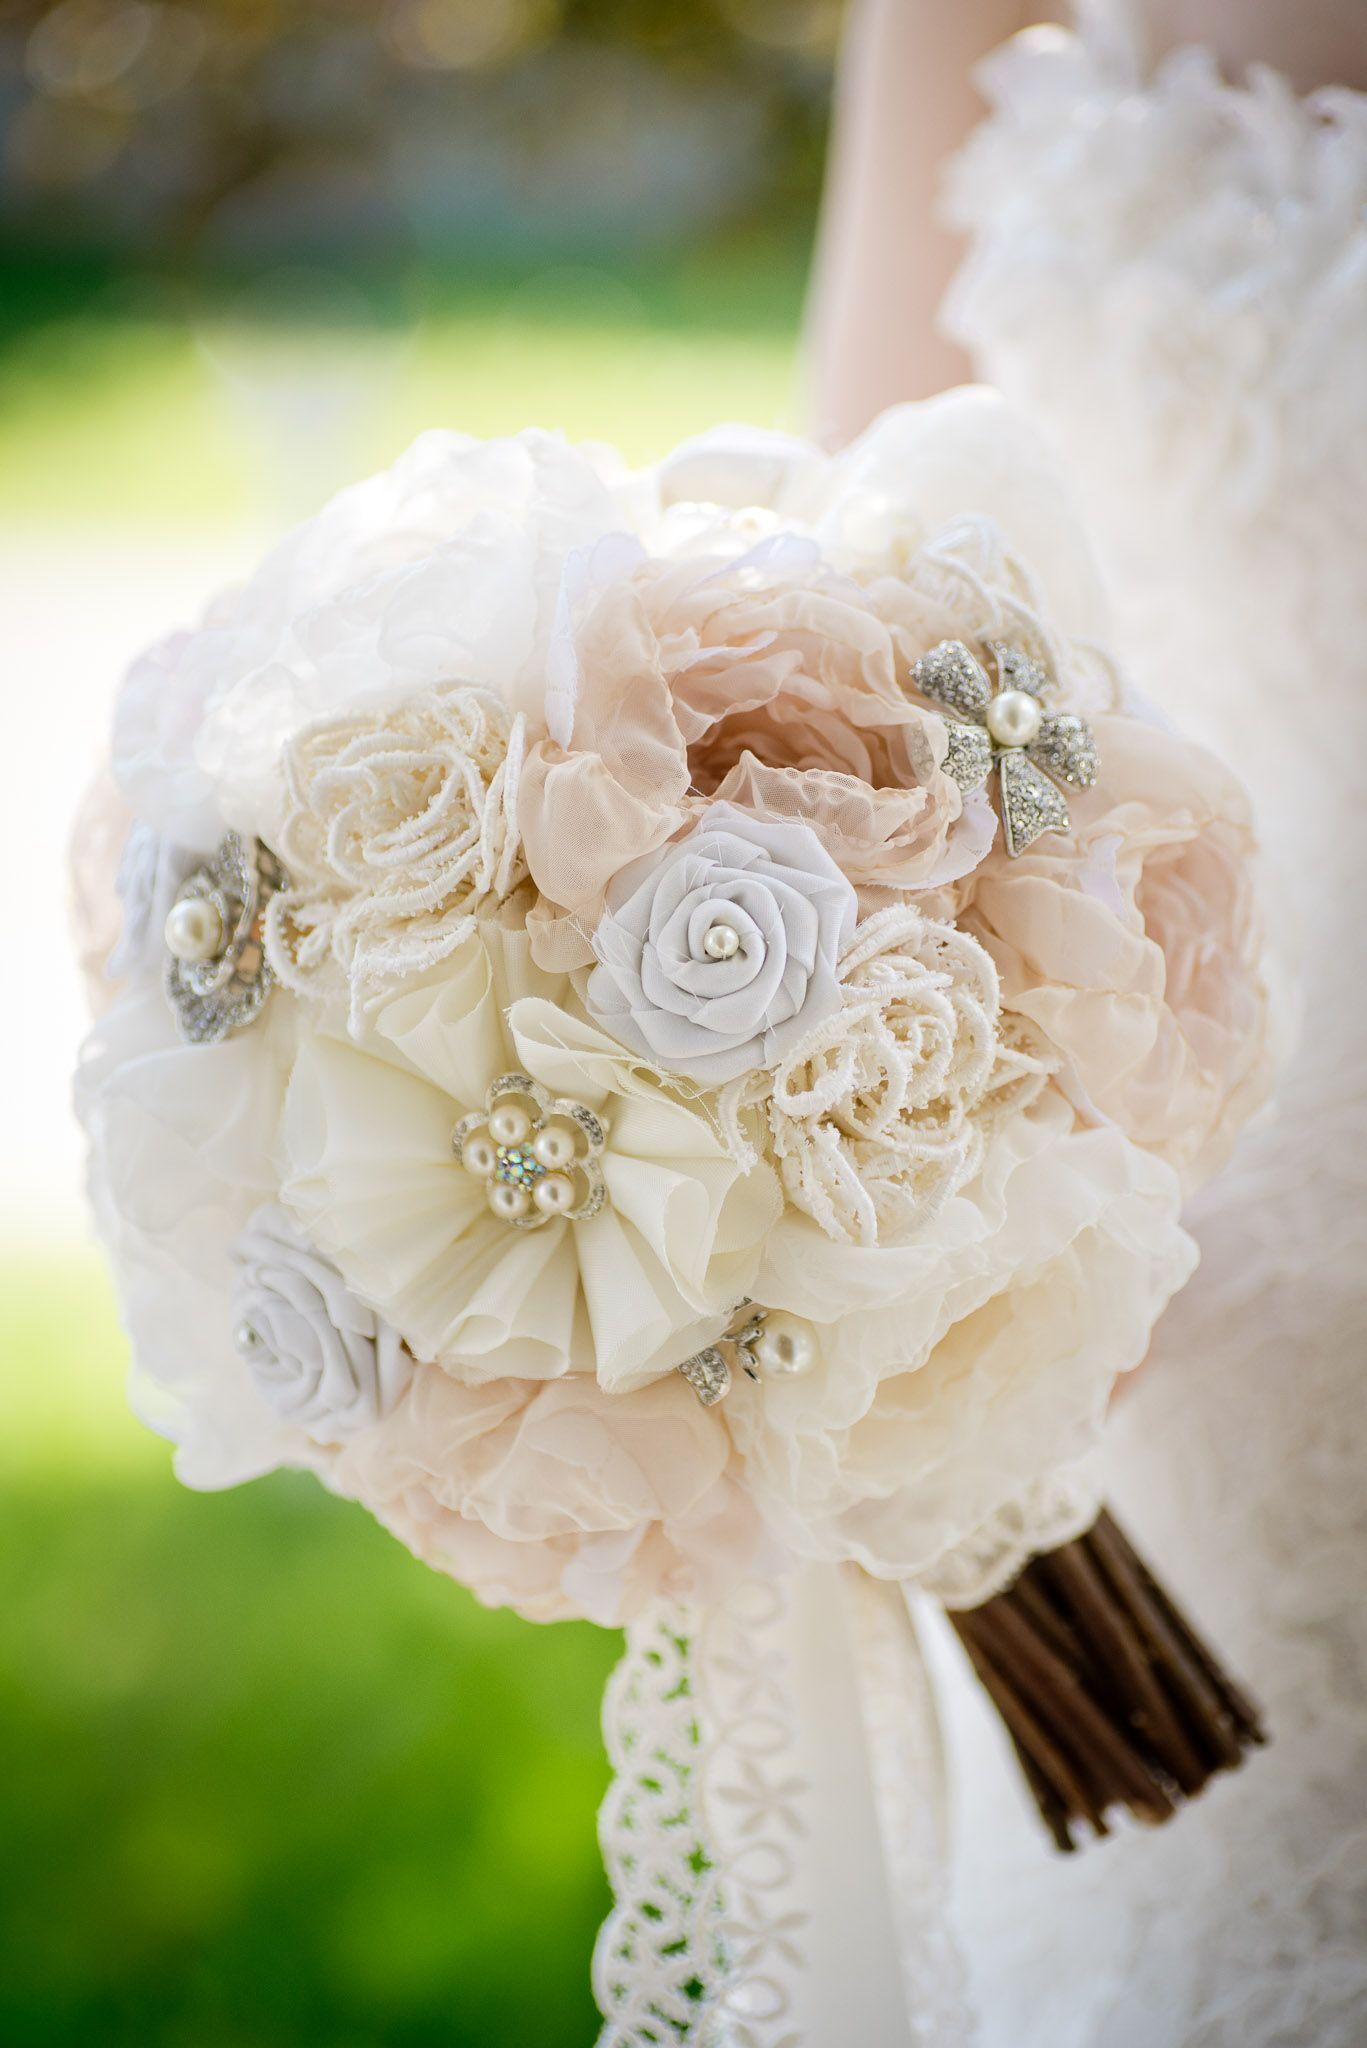 Blog | Mlle Artsy Fabric Flower Brooch Bouquet Handmade DIY Workshop ...